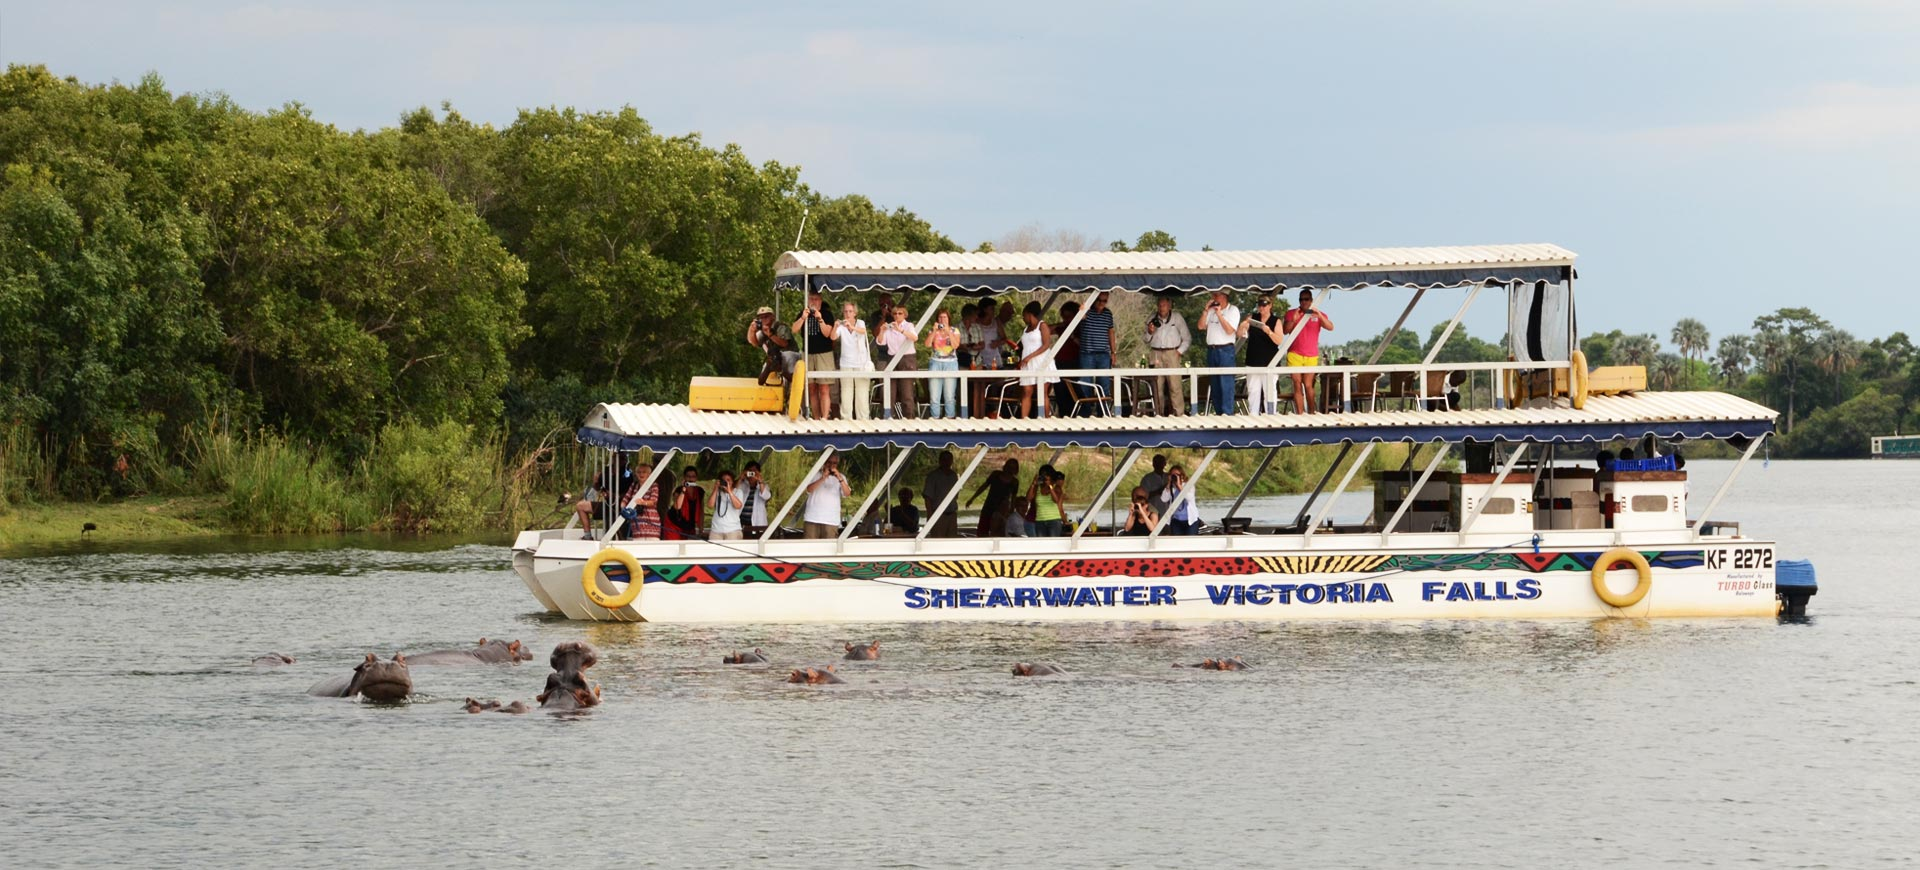 Victoria Falls Cruise